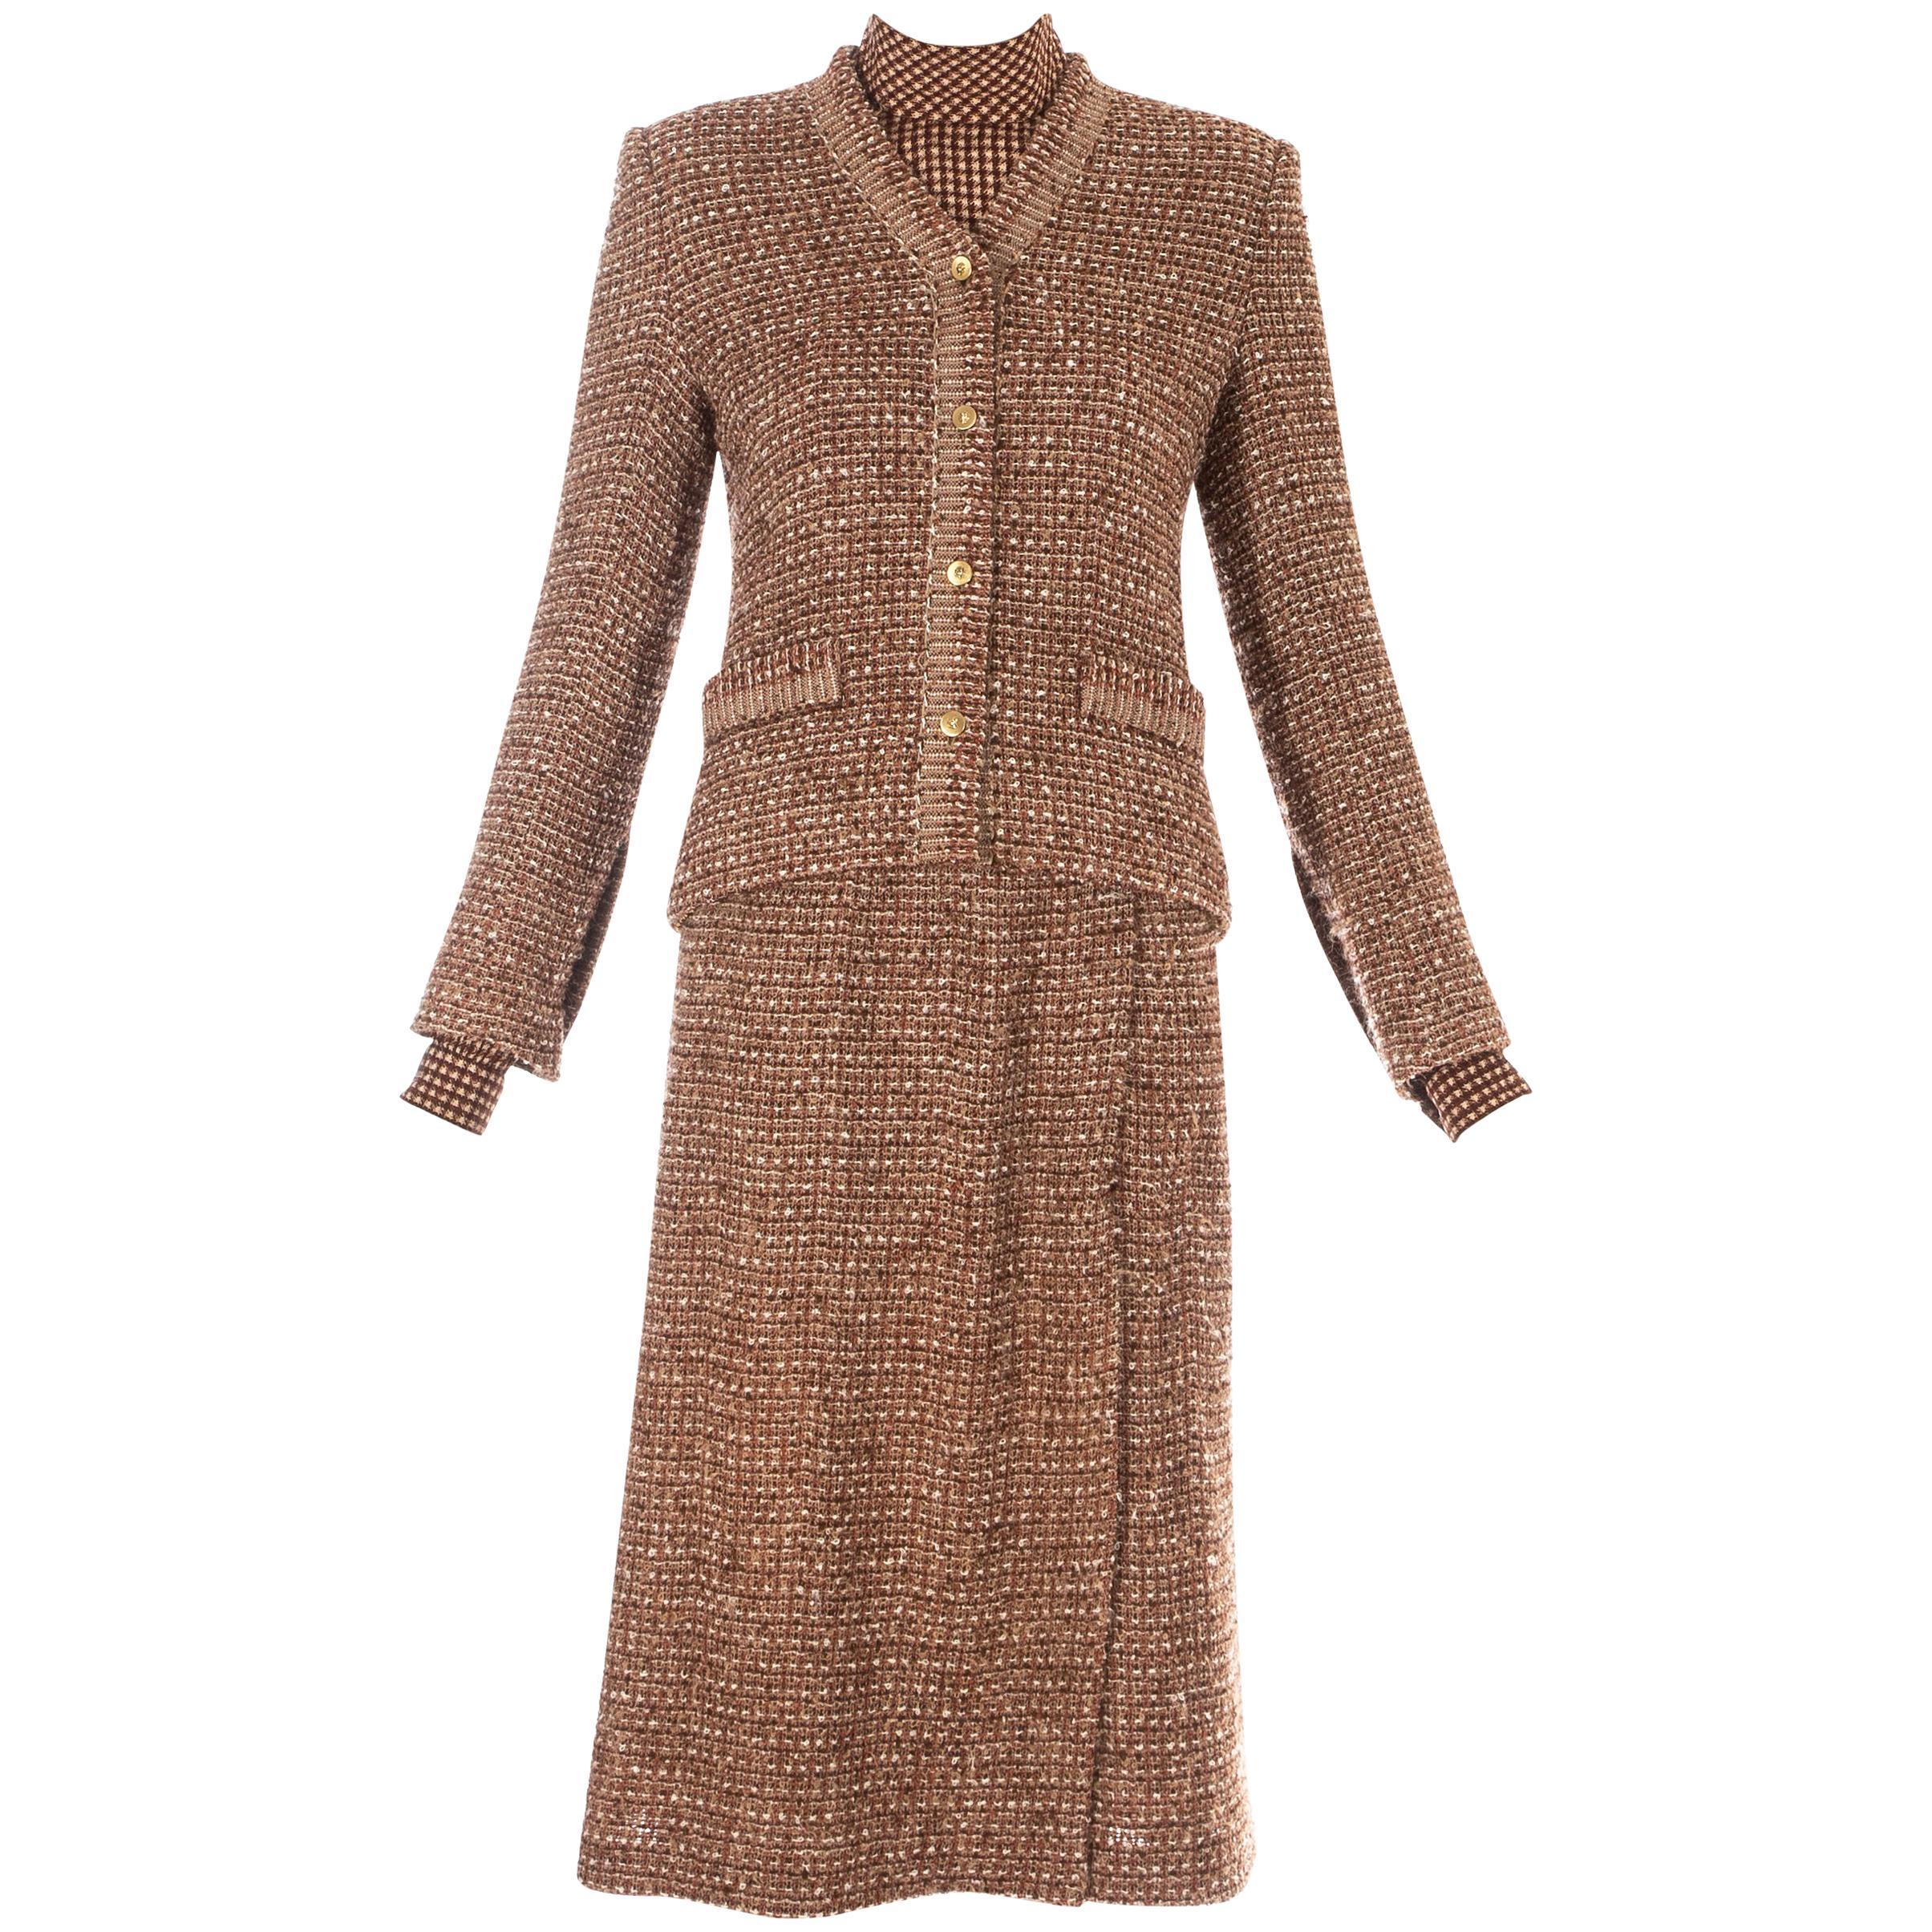 Chanel brown wool tweed 3 piece skirt suit, c. 1970s